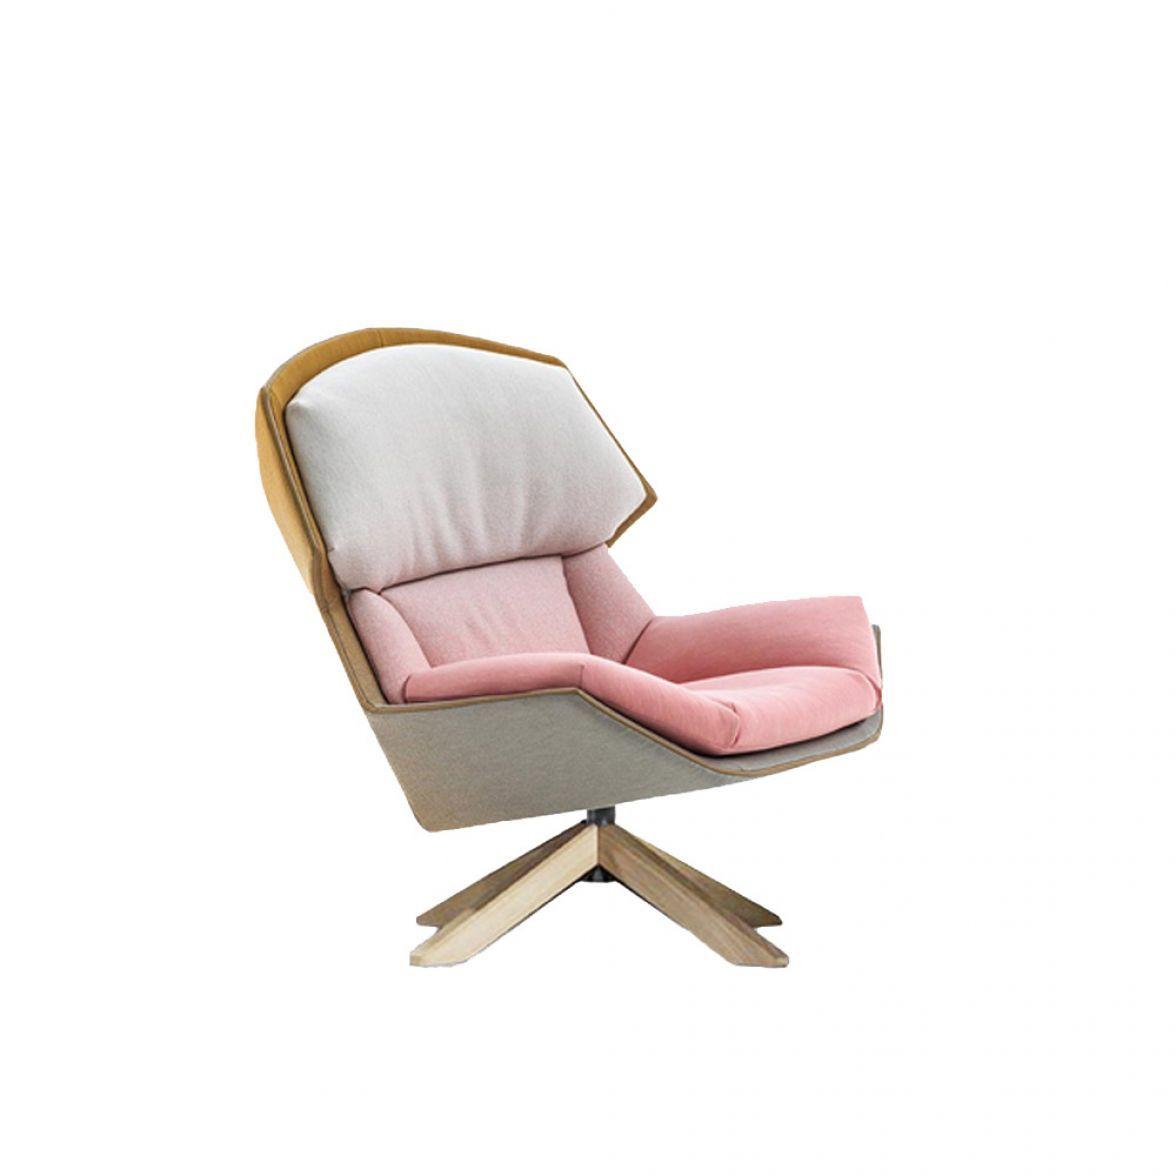 Clarissa armchair фото цена